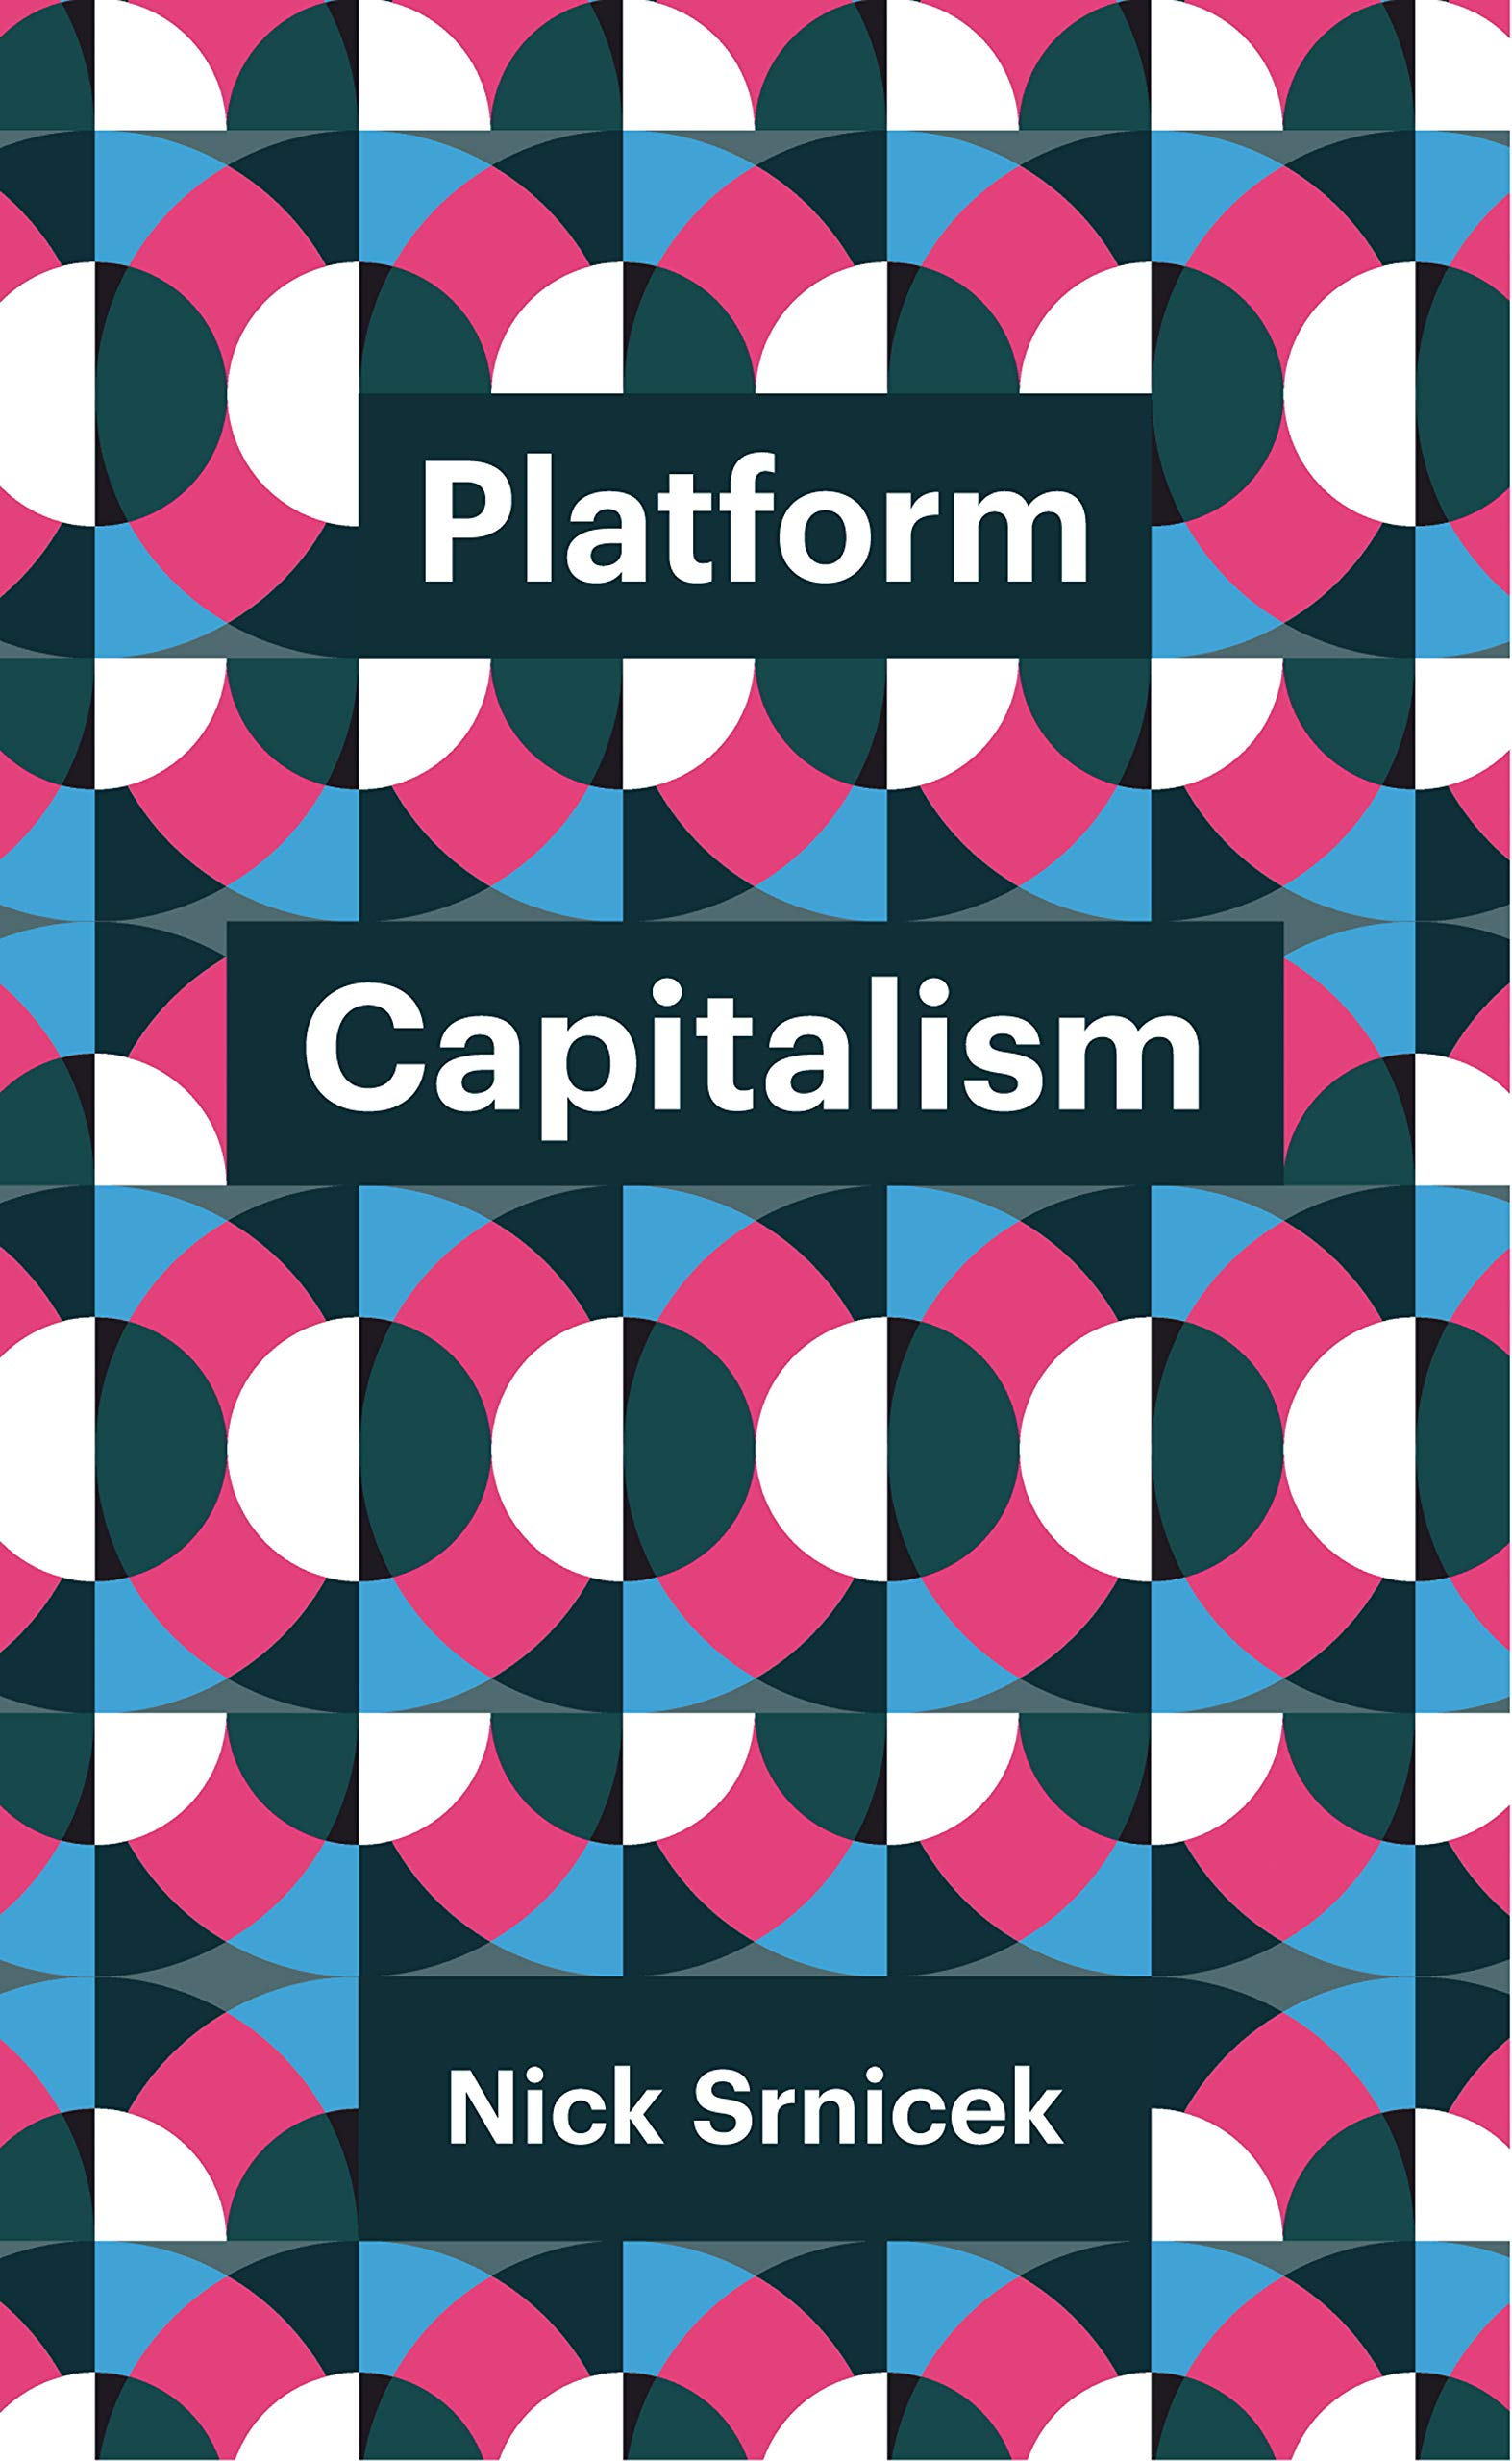 Srnicek, N: Platform Capitalism (Theory Redux): Amazon.es: Srnicek, Nick: Libros en idiomas extranjeros